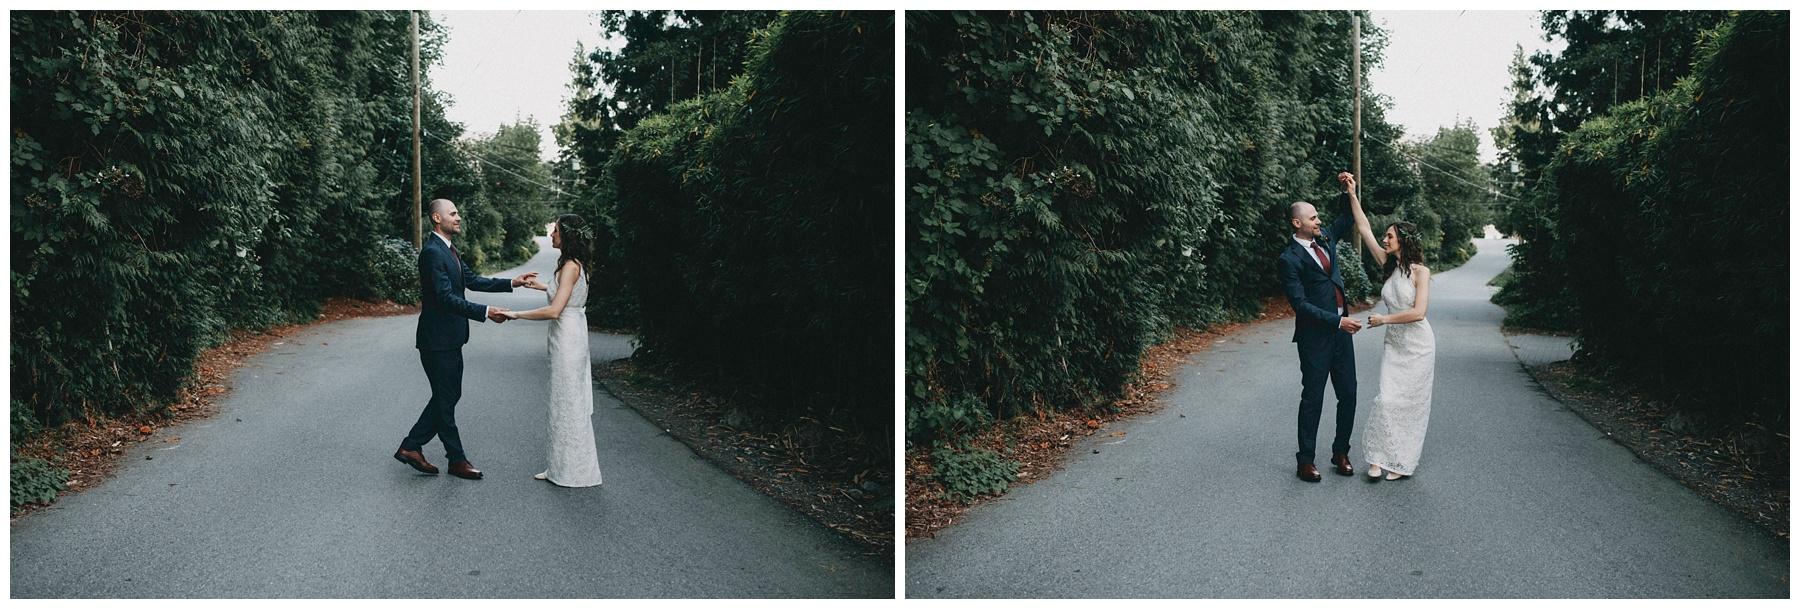 Vancouver intimate Wedding Photographer_0567.jpg